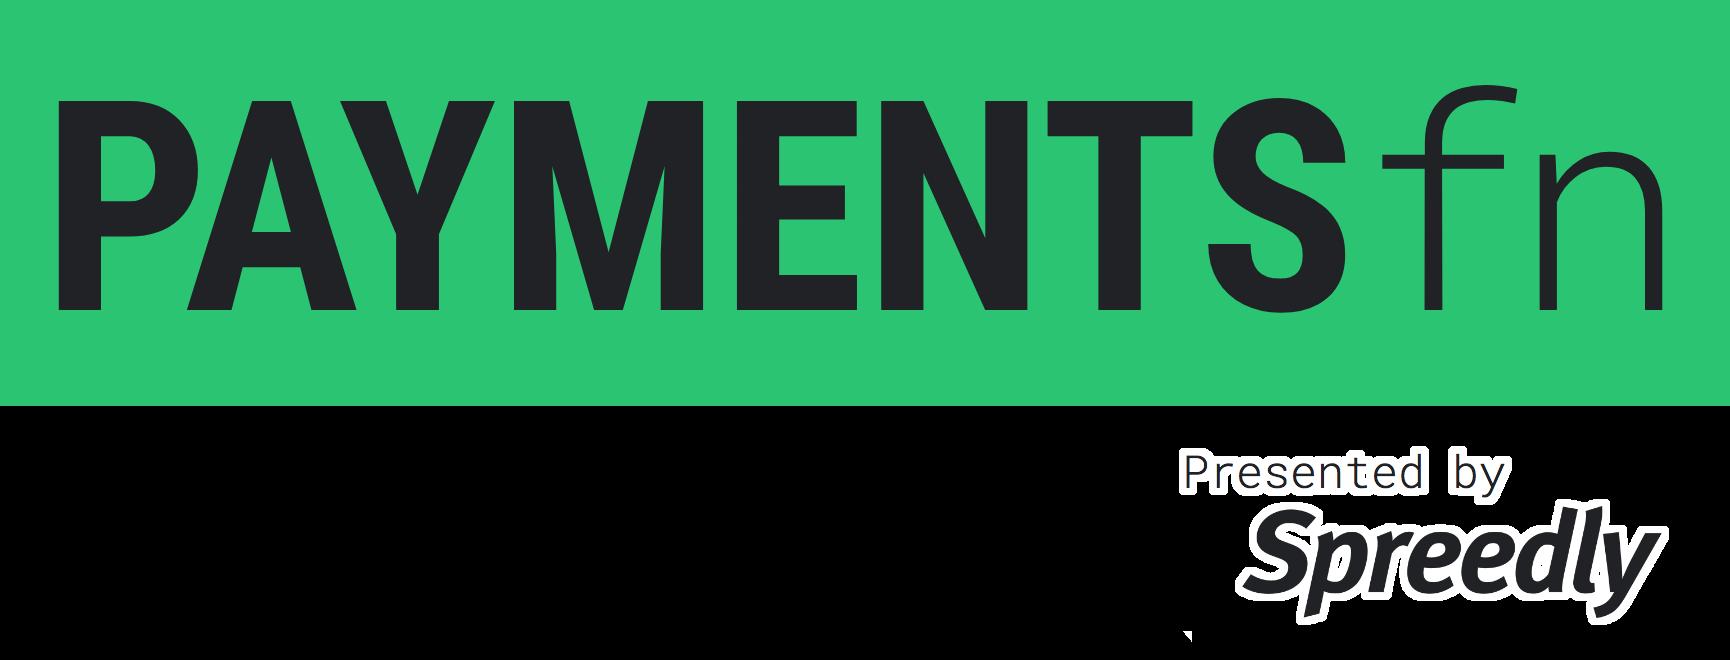 PAYMENTSfn 2018